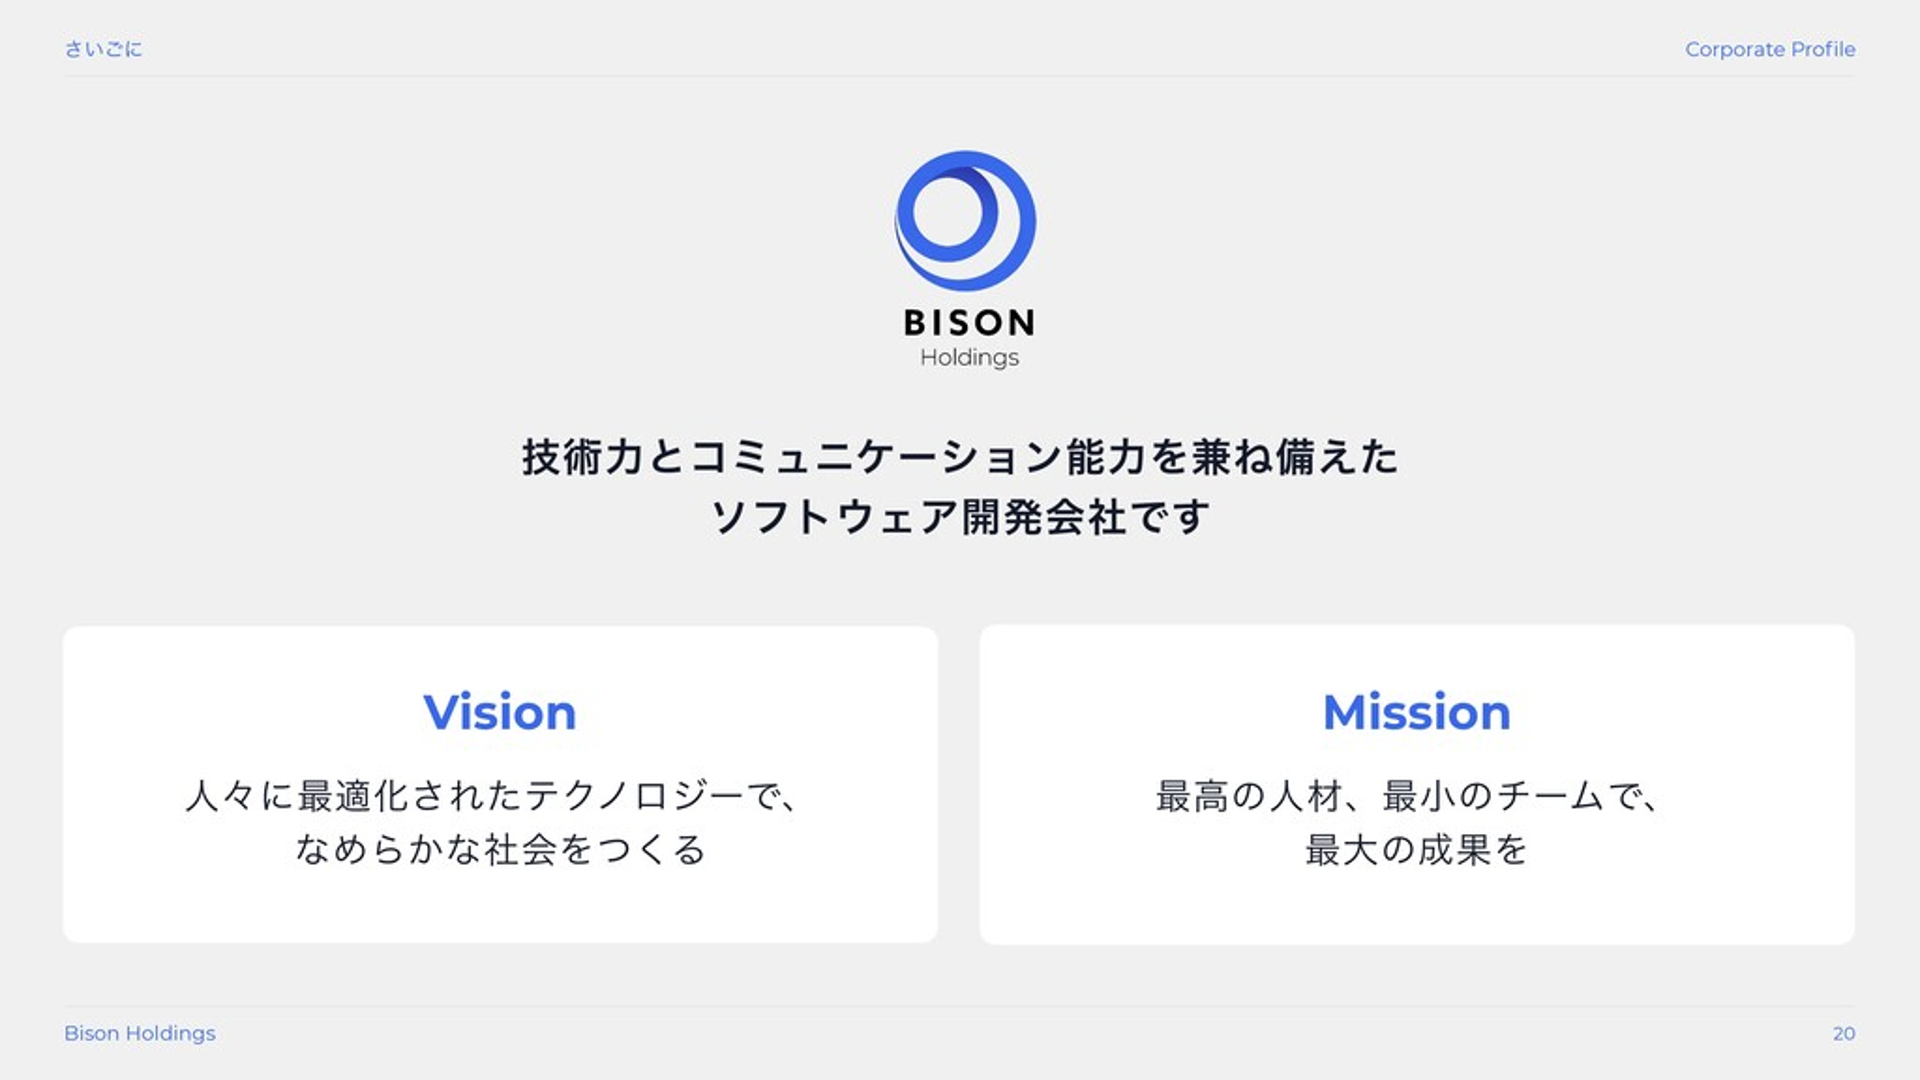 Bison Holdings Corporate Pro fi le 20 ͍͞͝ʹ ٕज़ྗͱ...